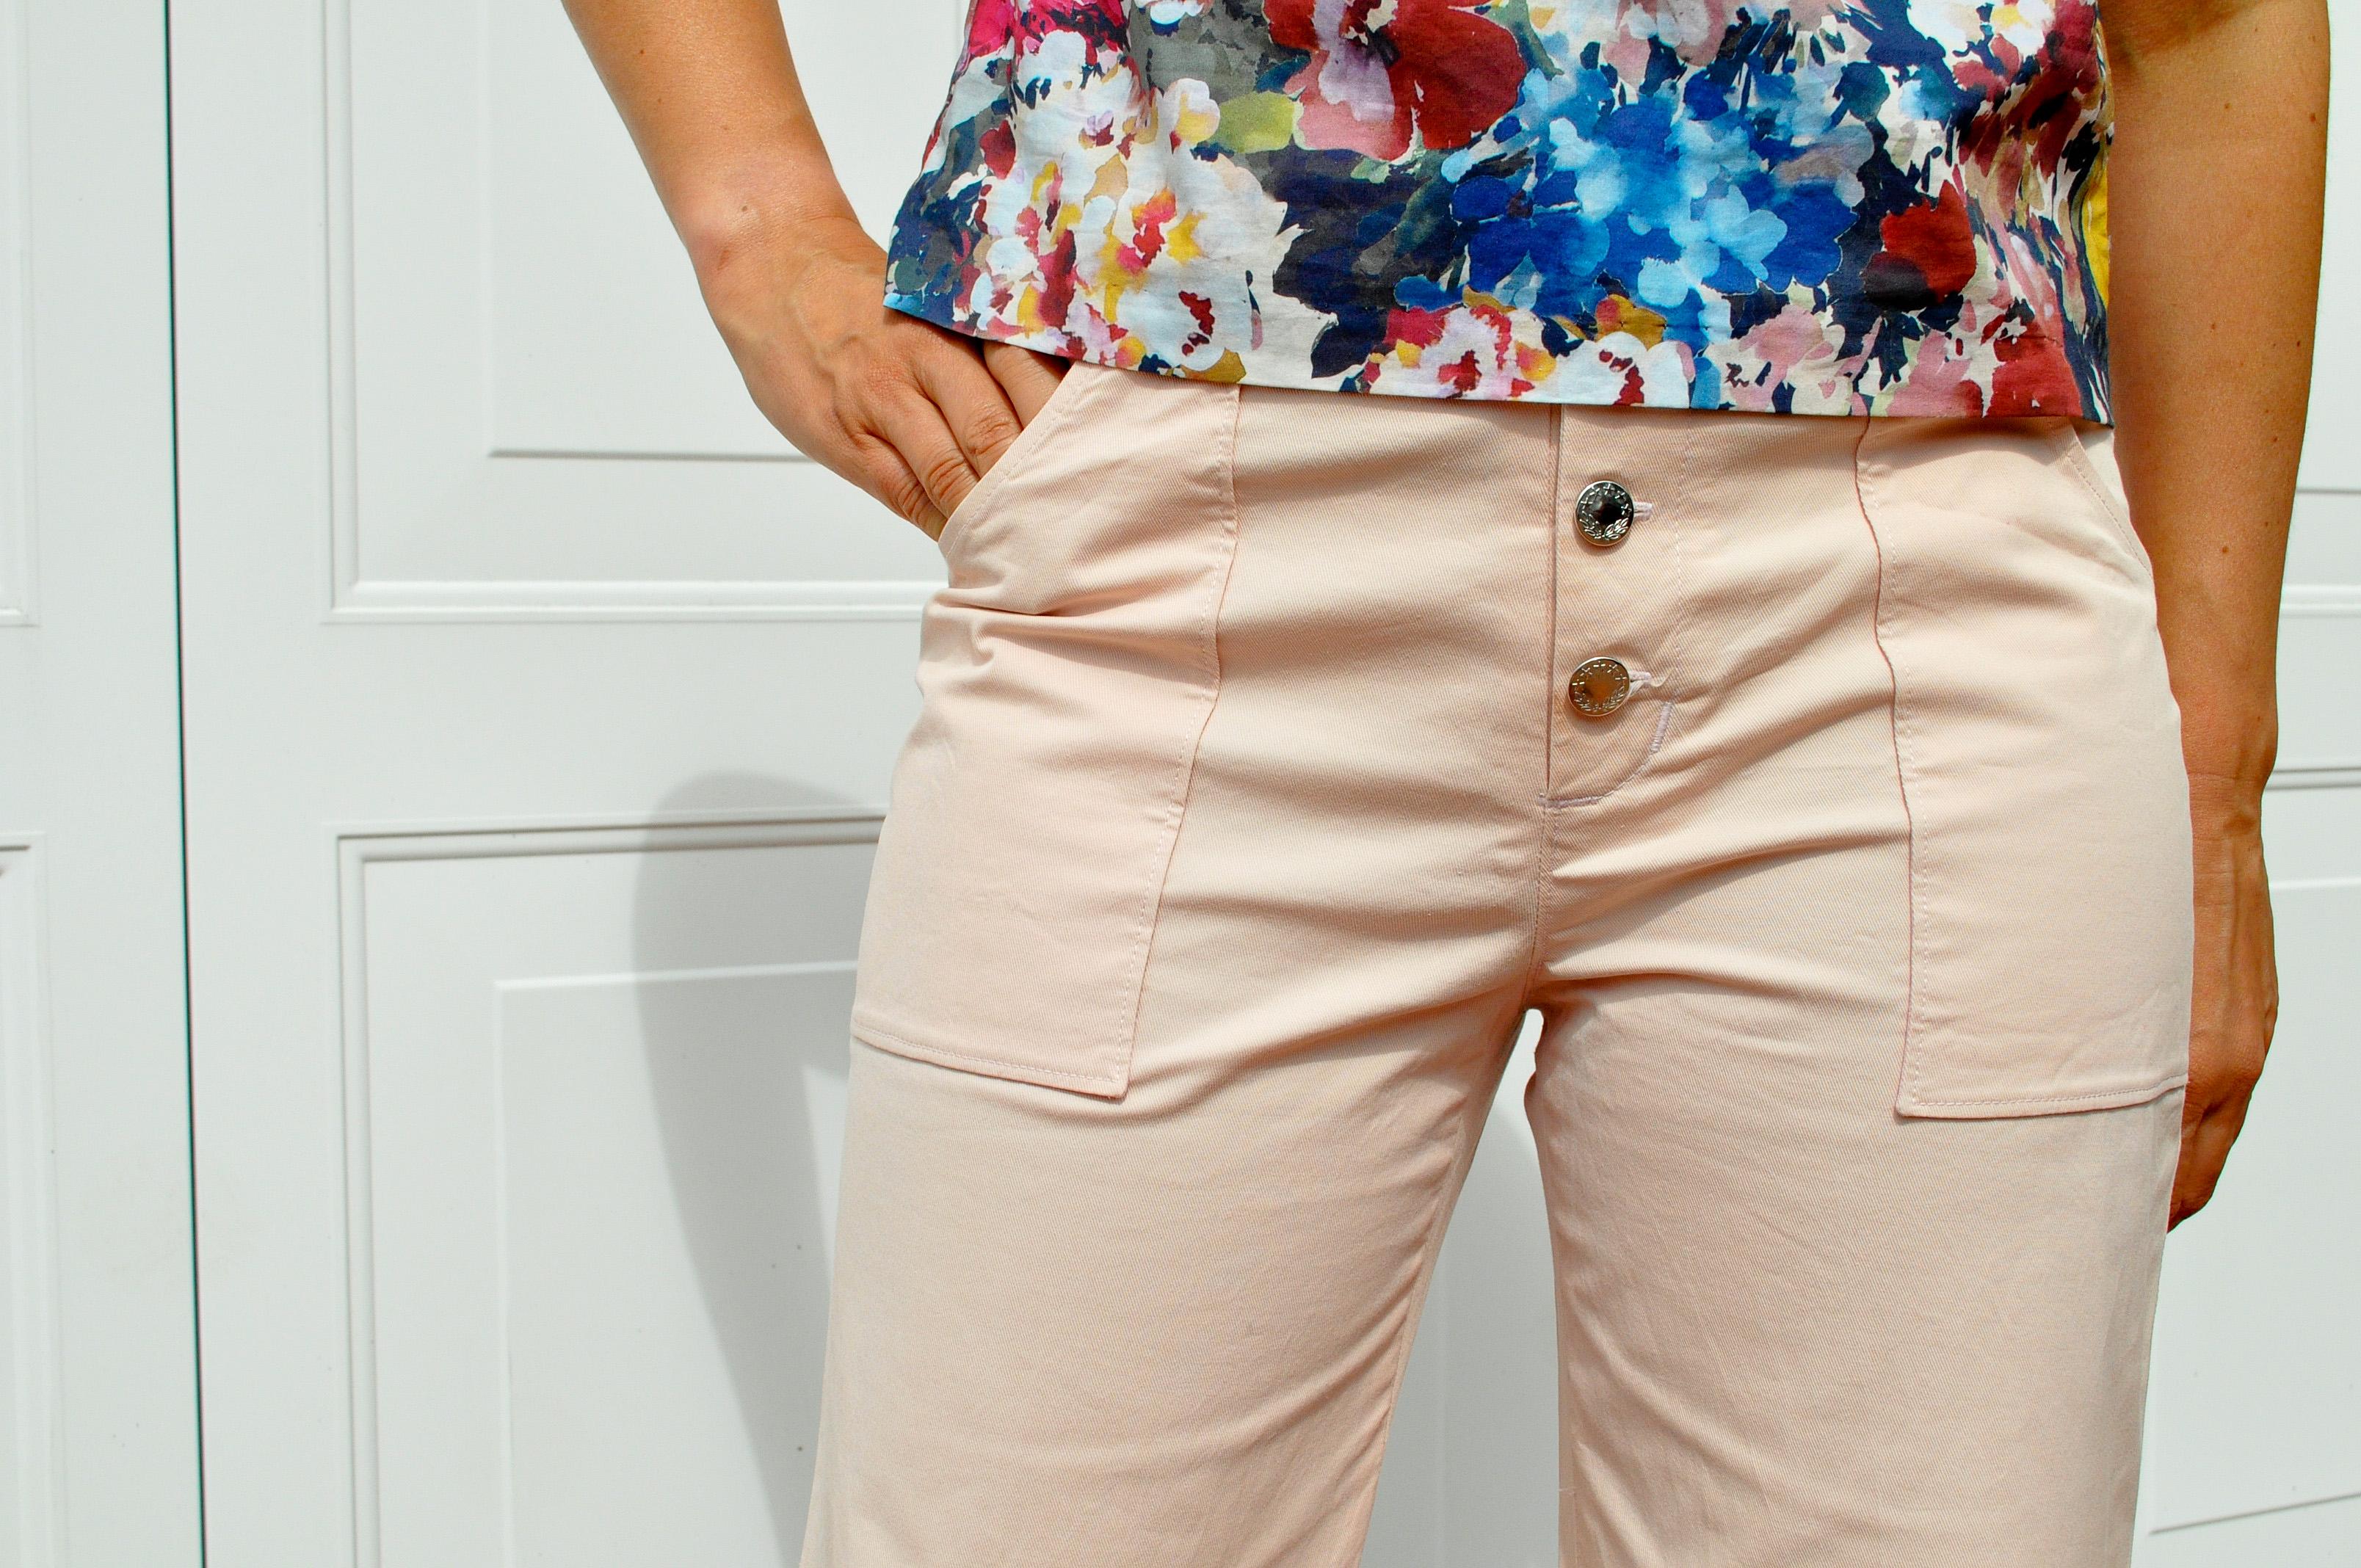 True Bias Lander pants + Butterick B6175 top